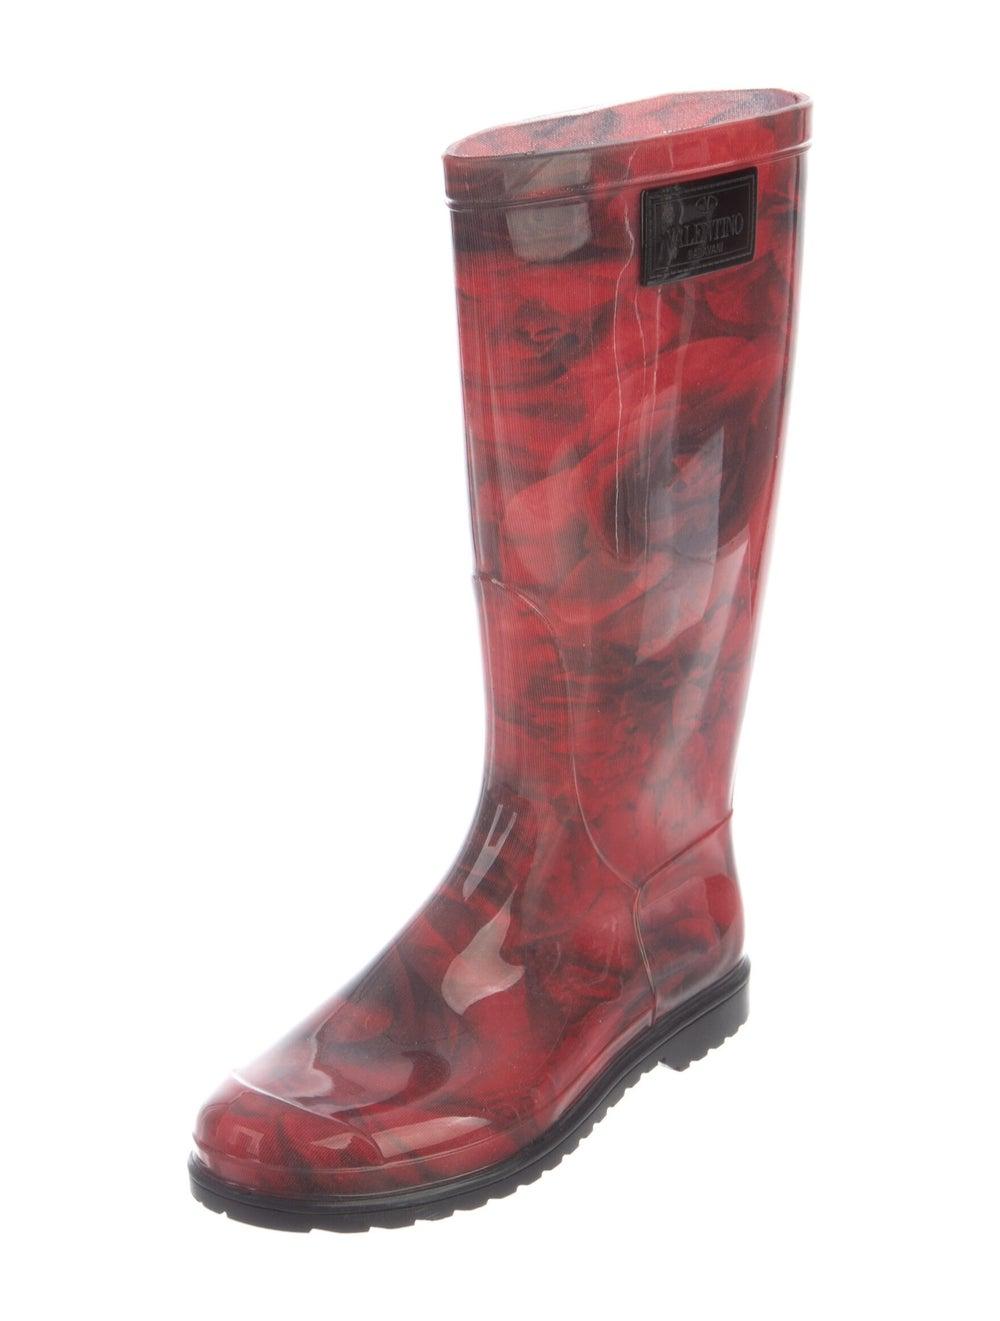 Valentino Rainboots Floral Print Rain Boots Red - image 2